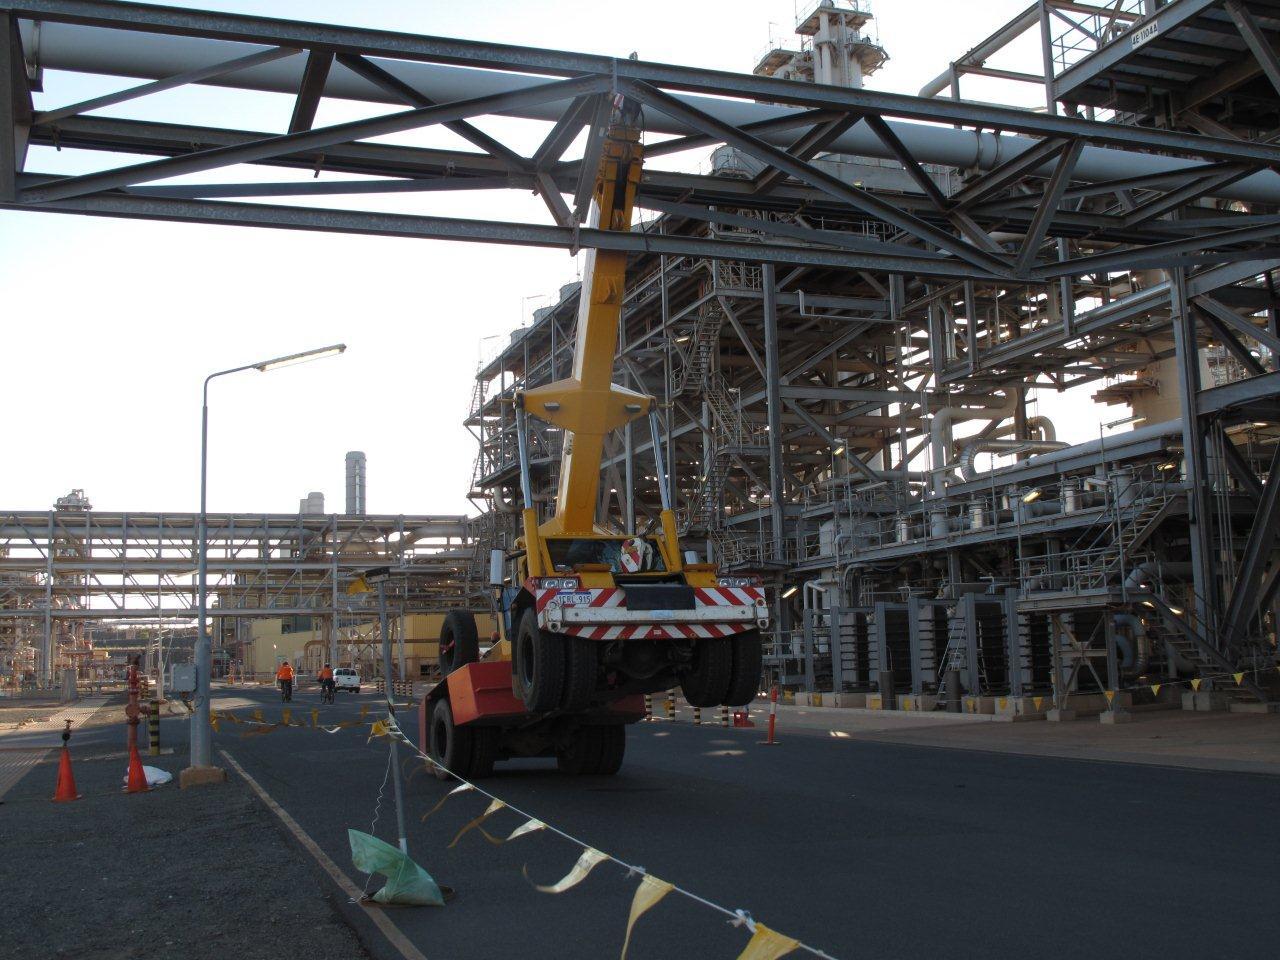 Overhead Cranes Queensland : Crane jib gets caught up down under